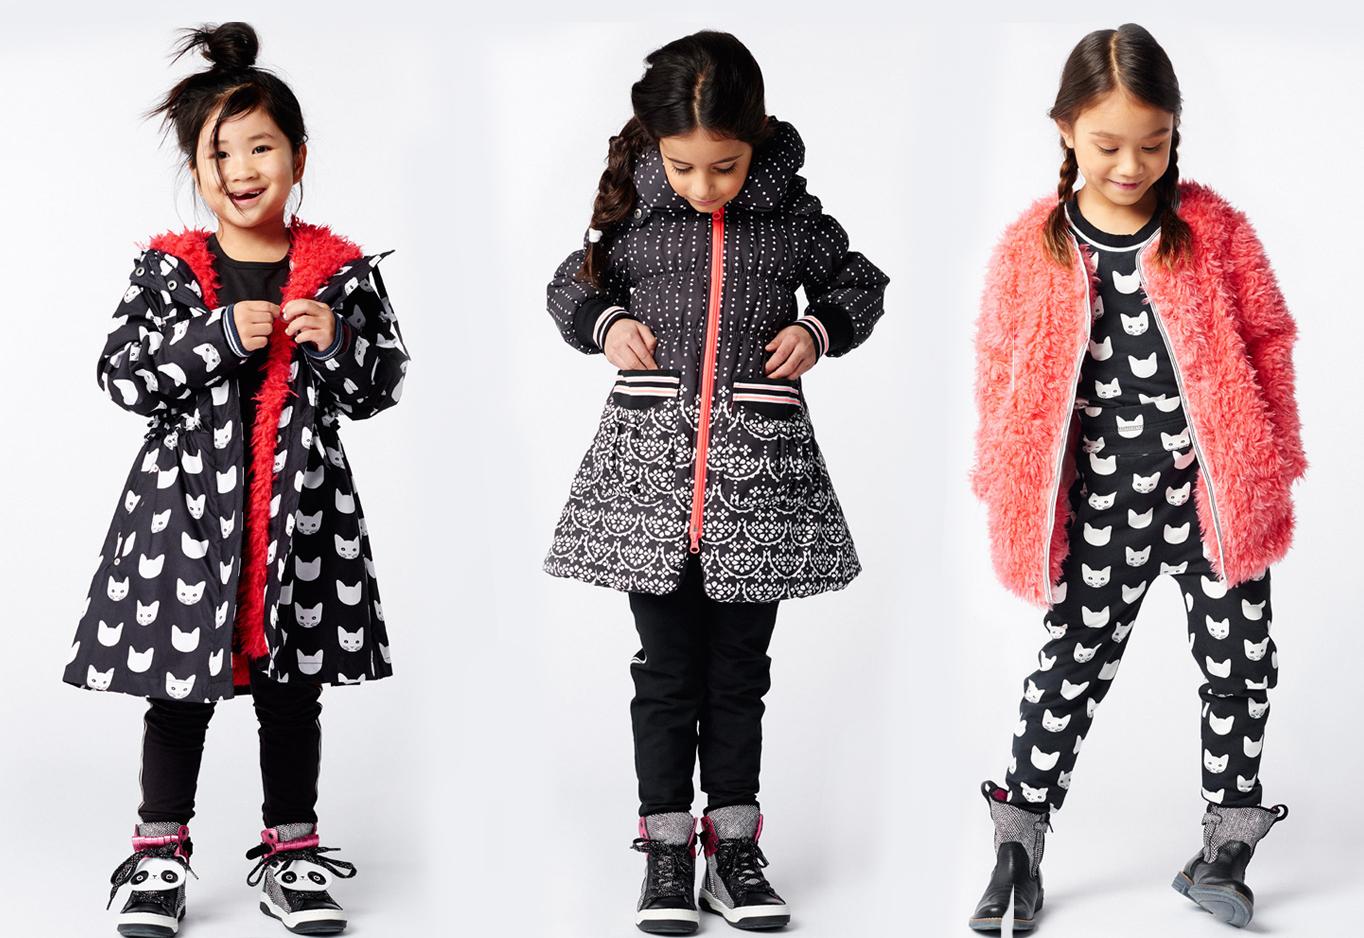 Mim-Pi winter 2016 meisjes jas winterjas kinderkleding